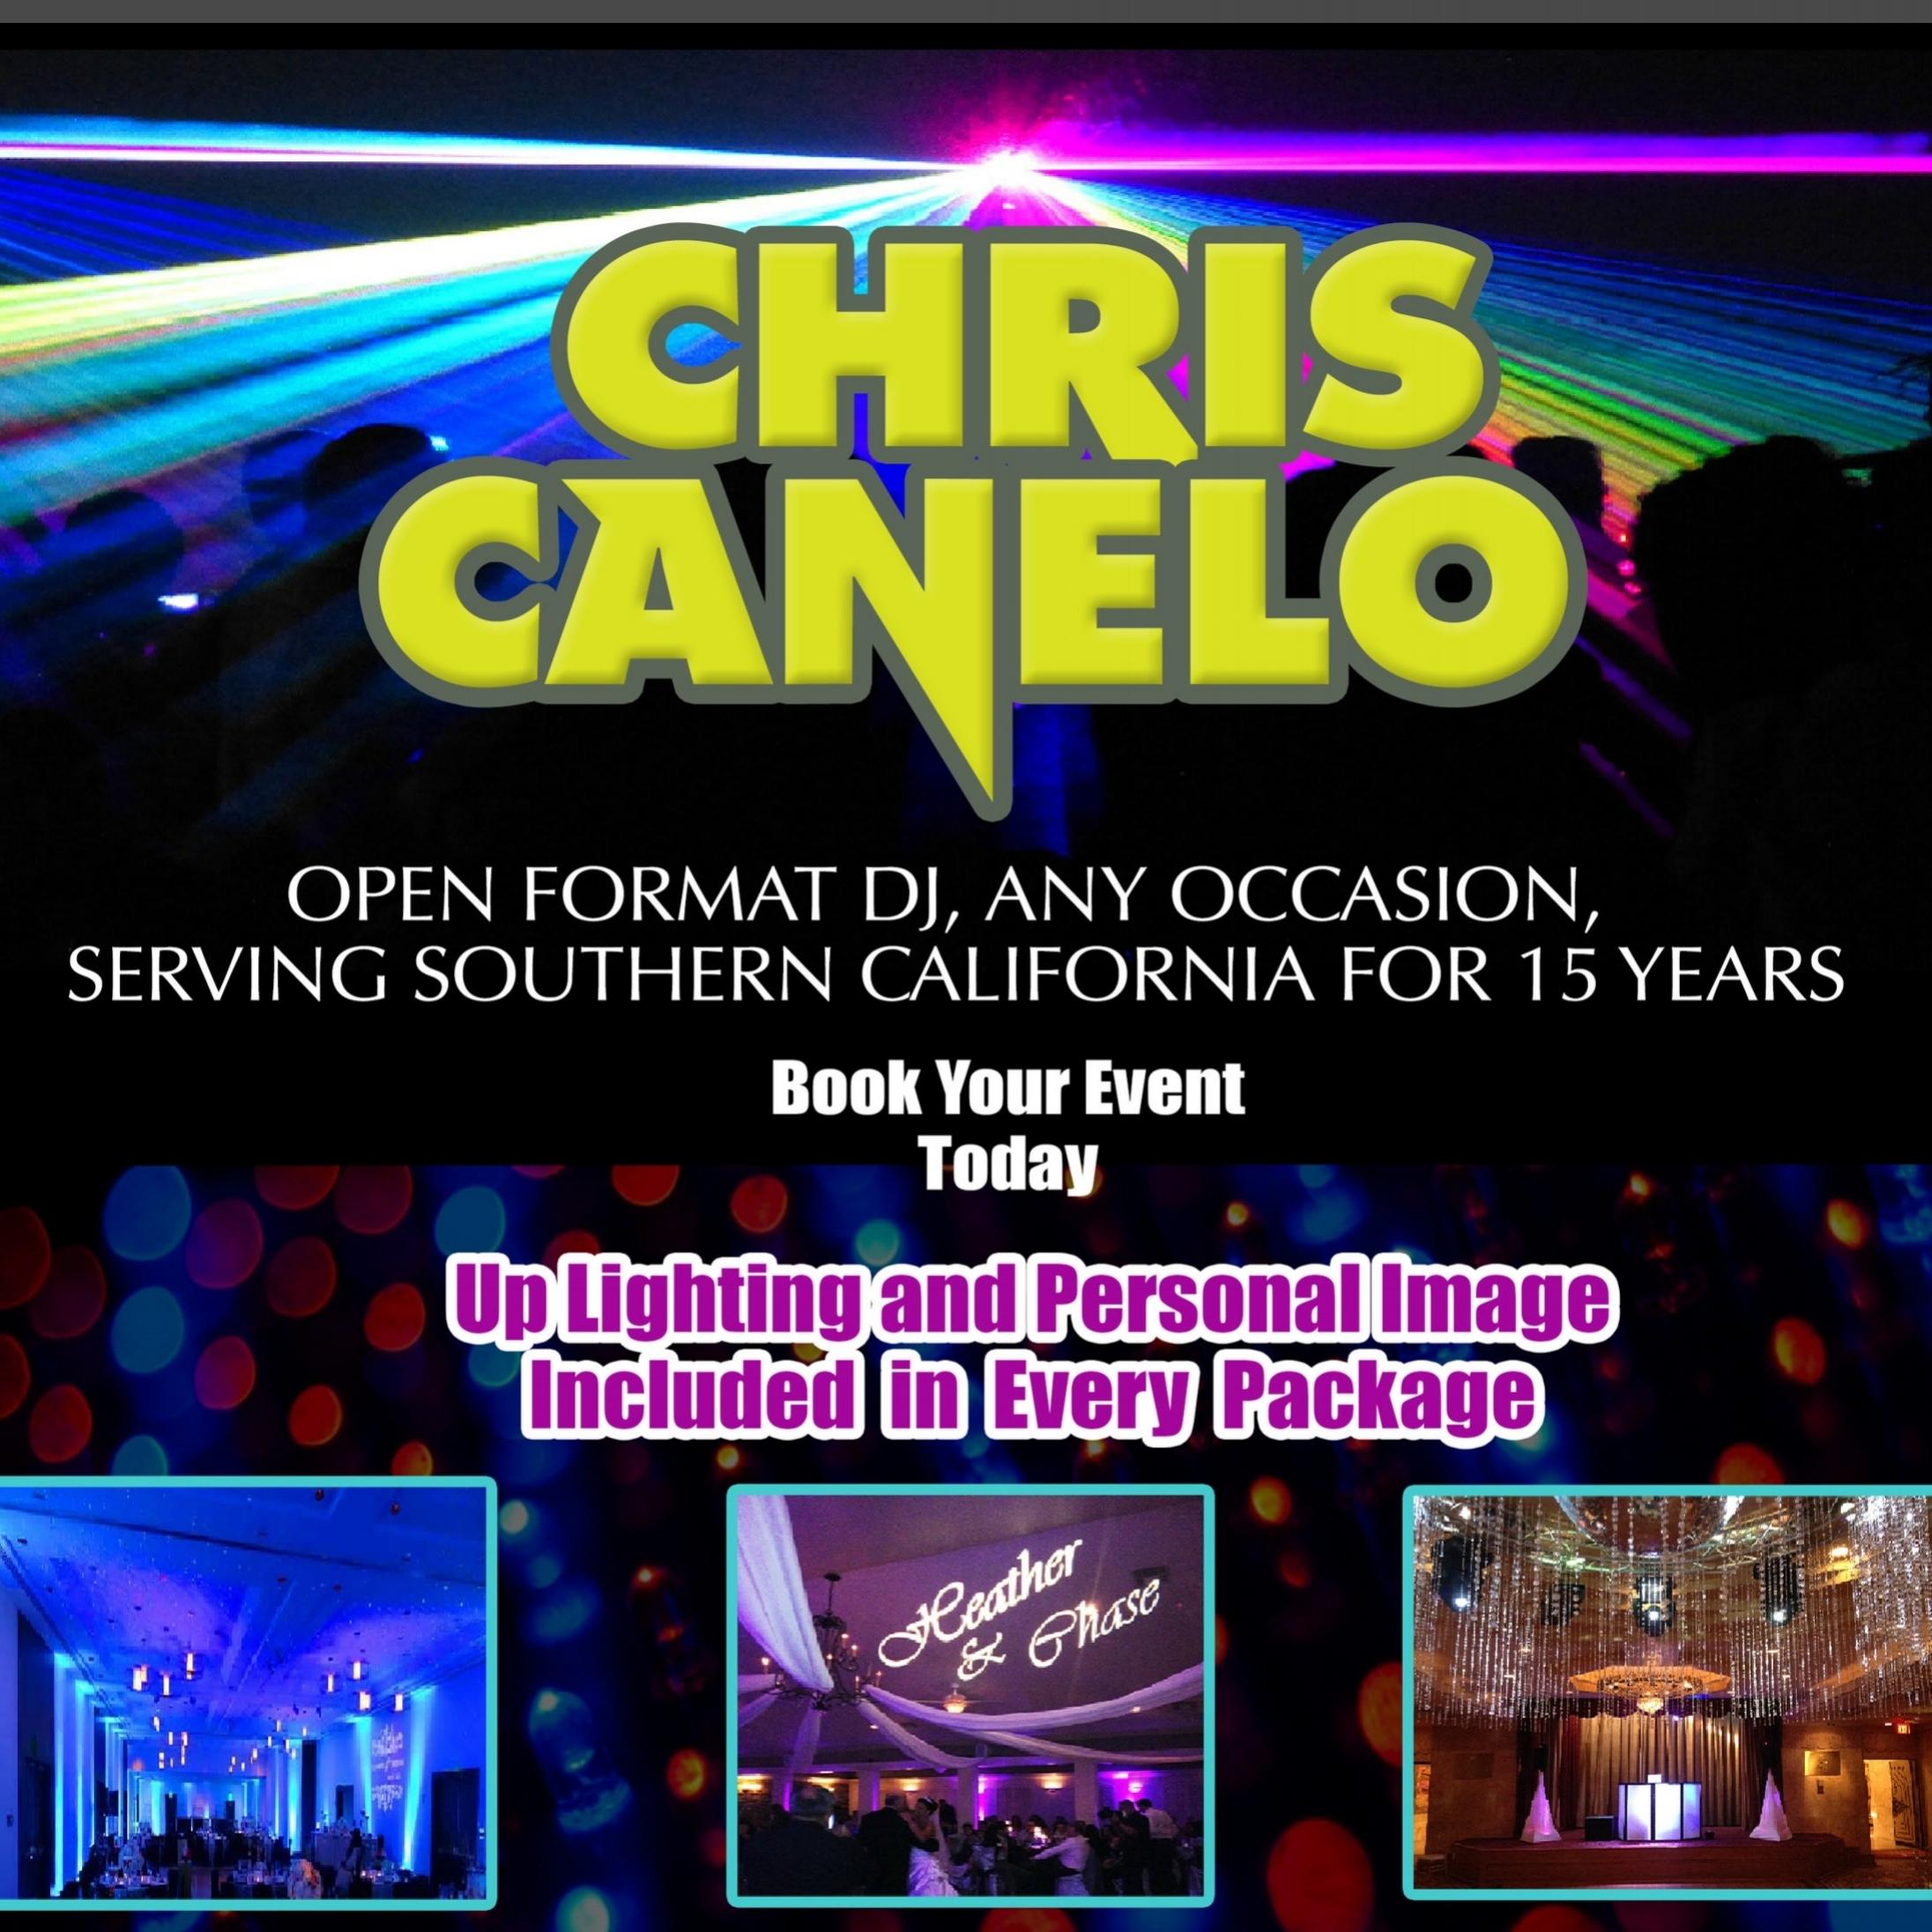 Chris Canelo DJ Services eflyer.jpg